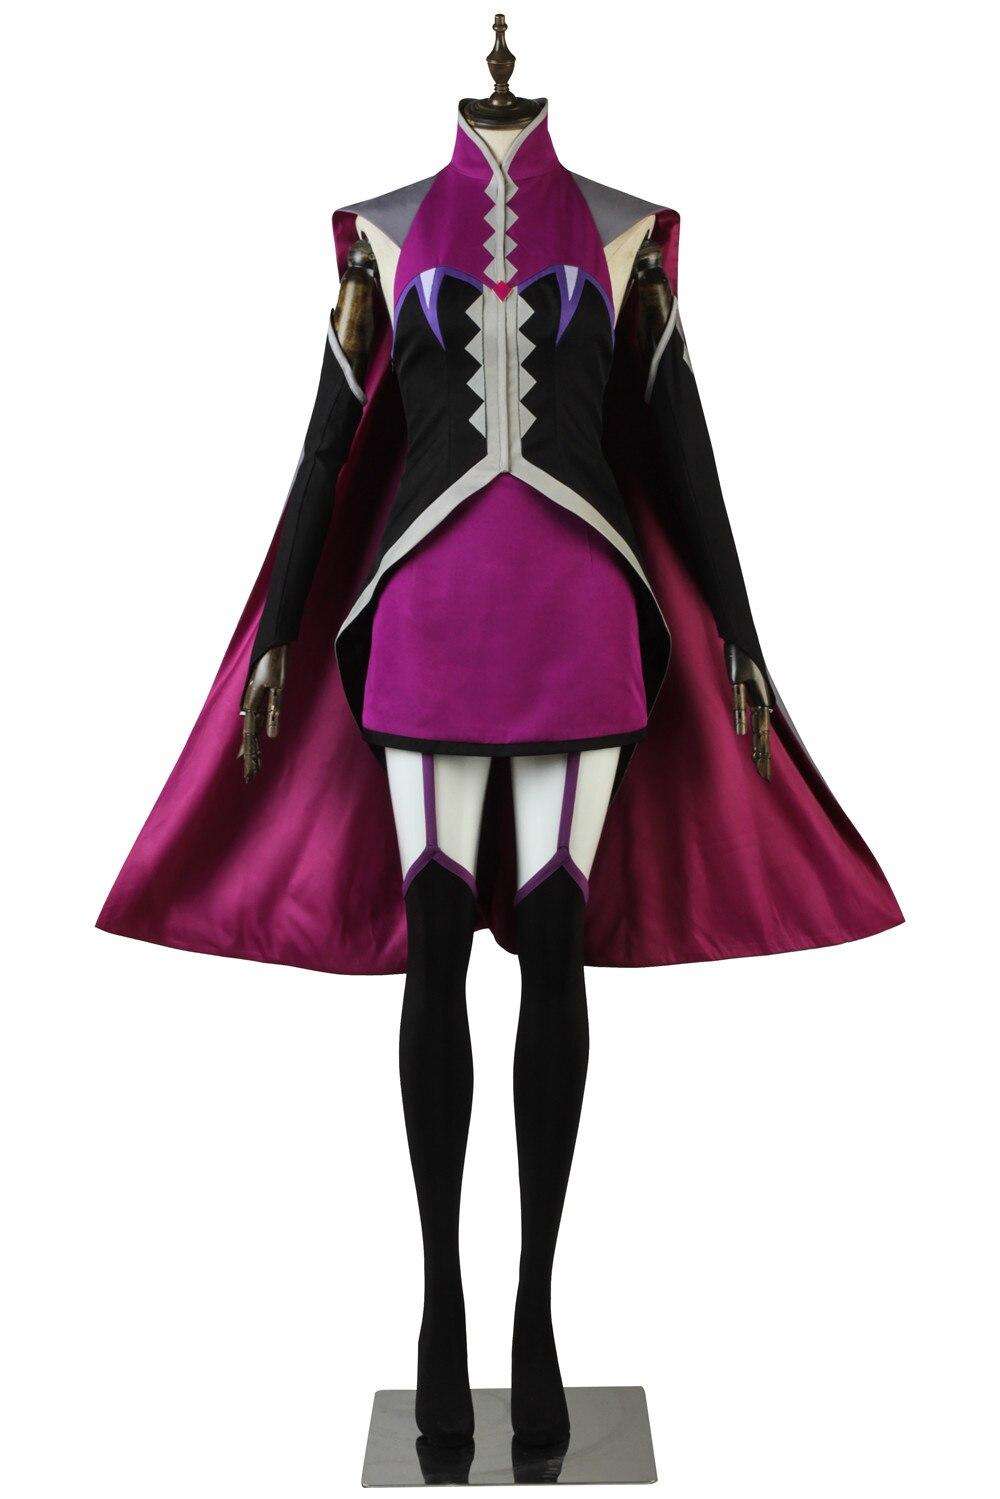 Cosplaydiy Anime Hugtto jolie Cure Lulu Cosplay Costume adulte filles femmes Halloween fantaisie fête robes L320